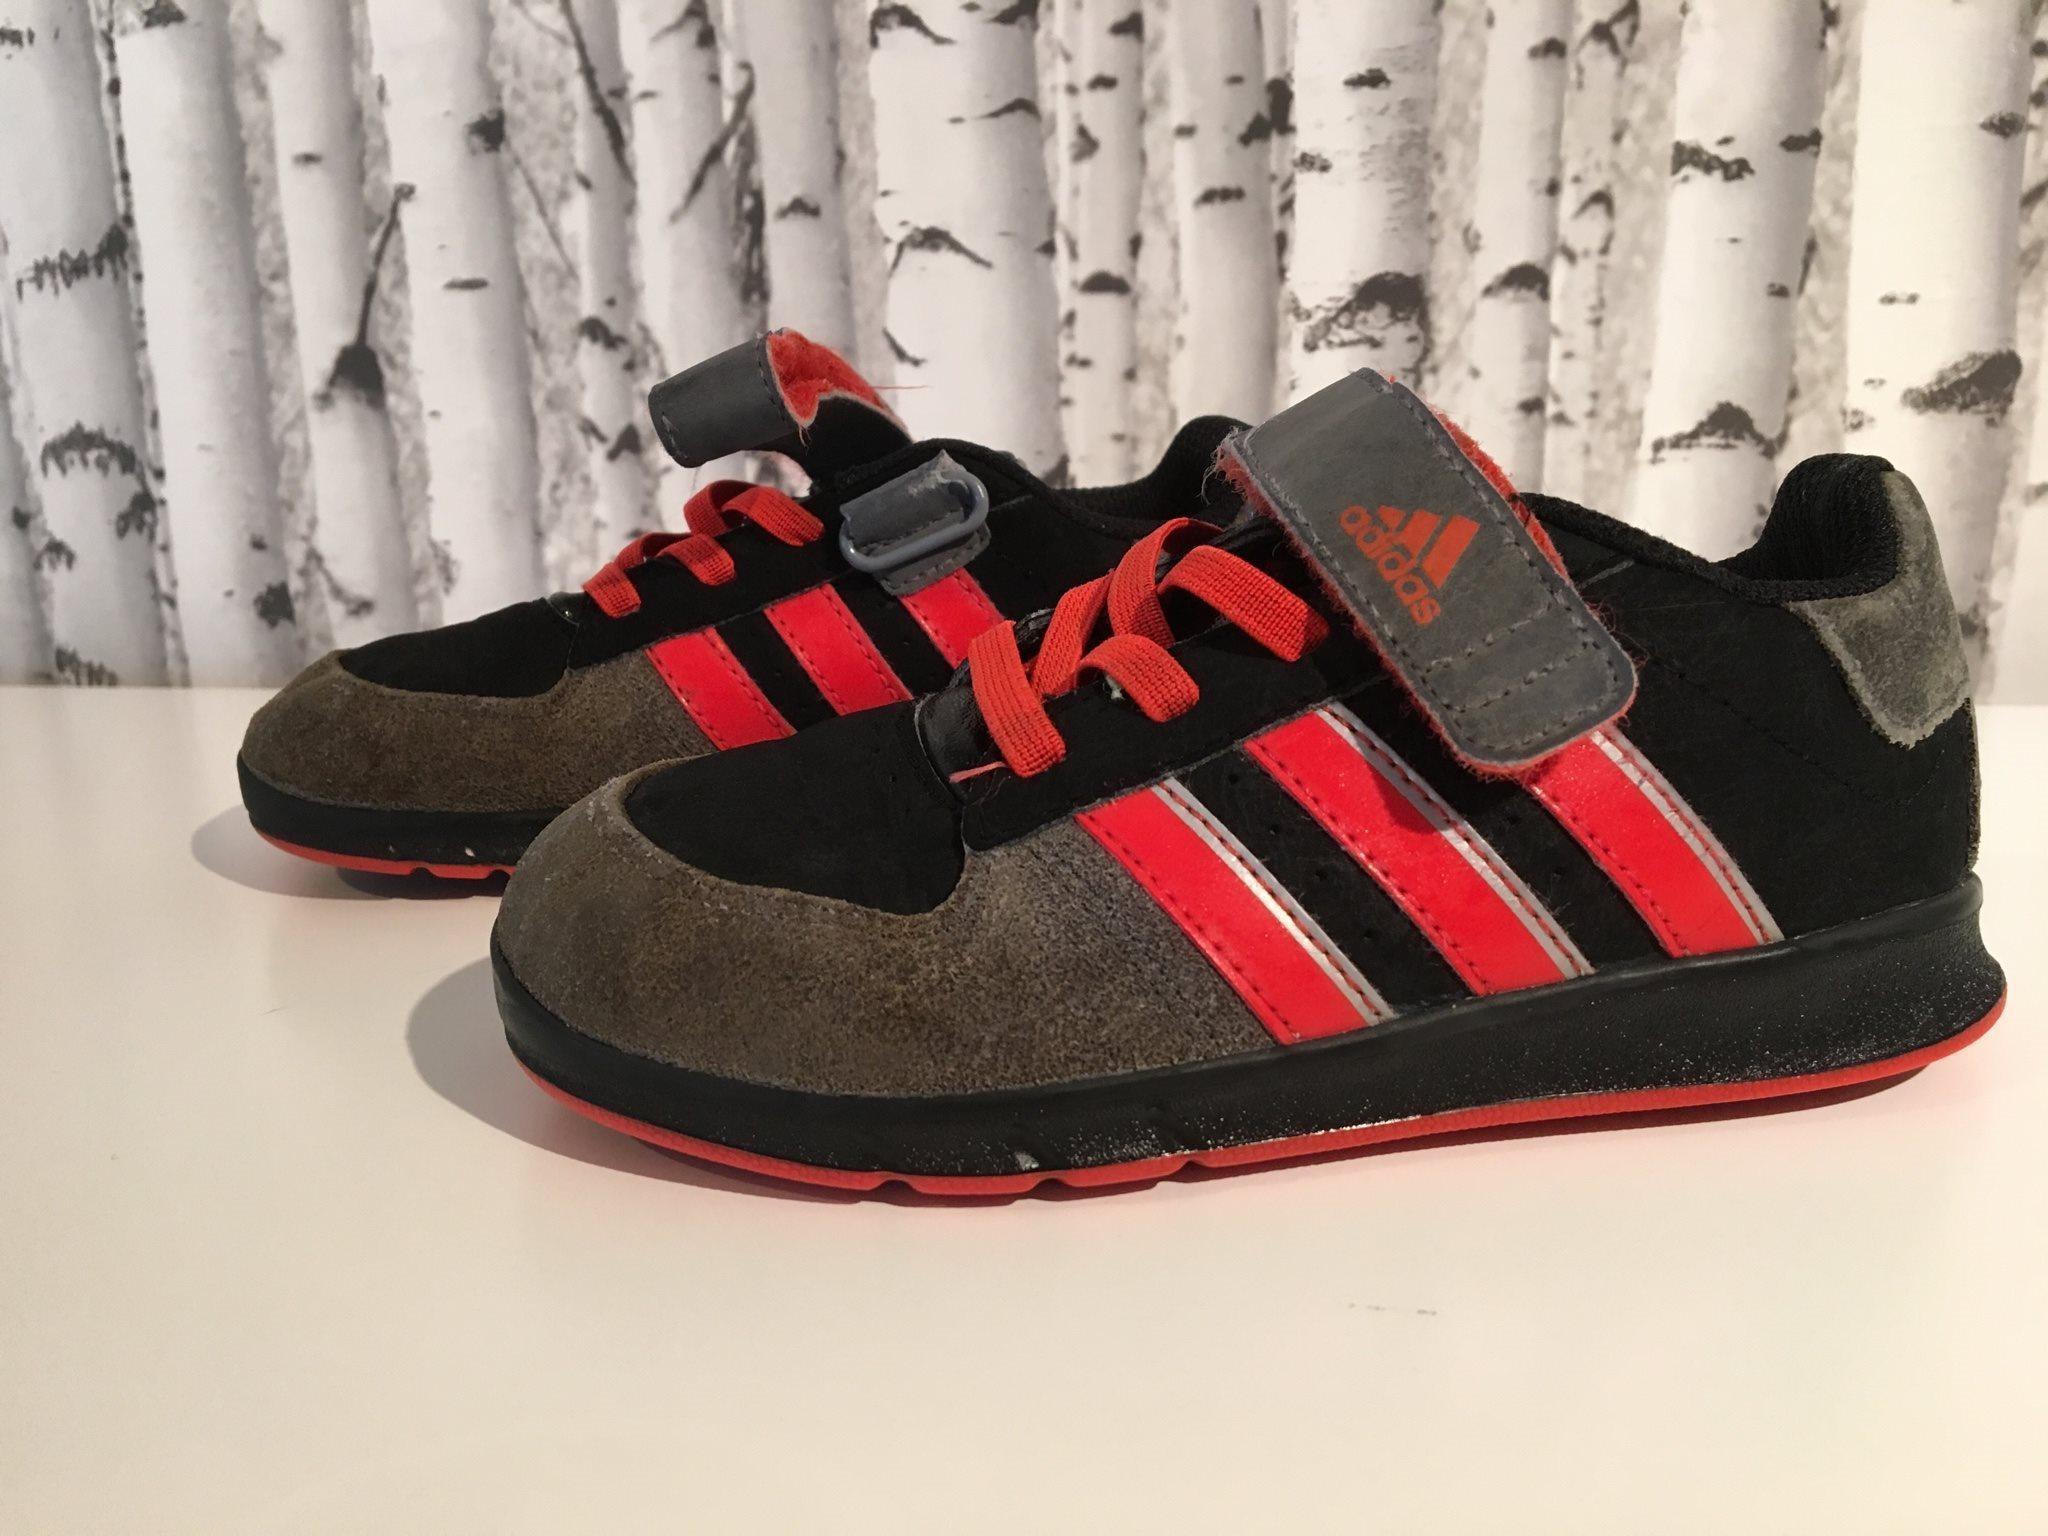 best sneakers 8ffb0 78467 Fina Fina ADIDAS BARN Fina BARN skor 311996437 311996437 skor ADIDAS qEww54